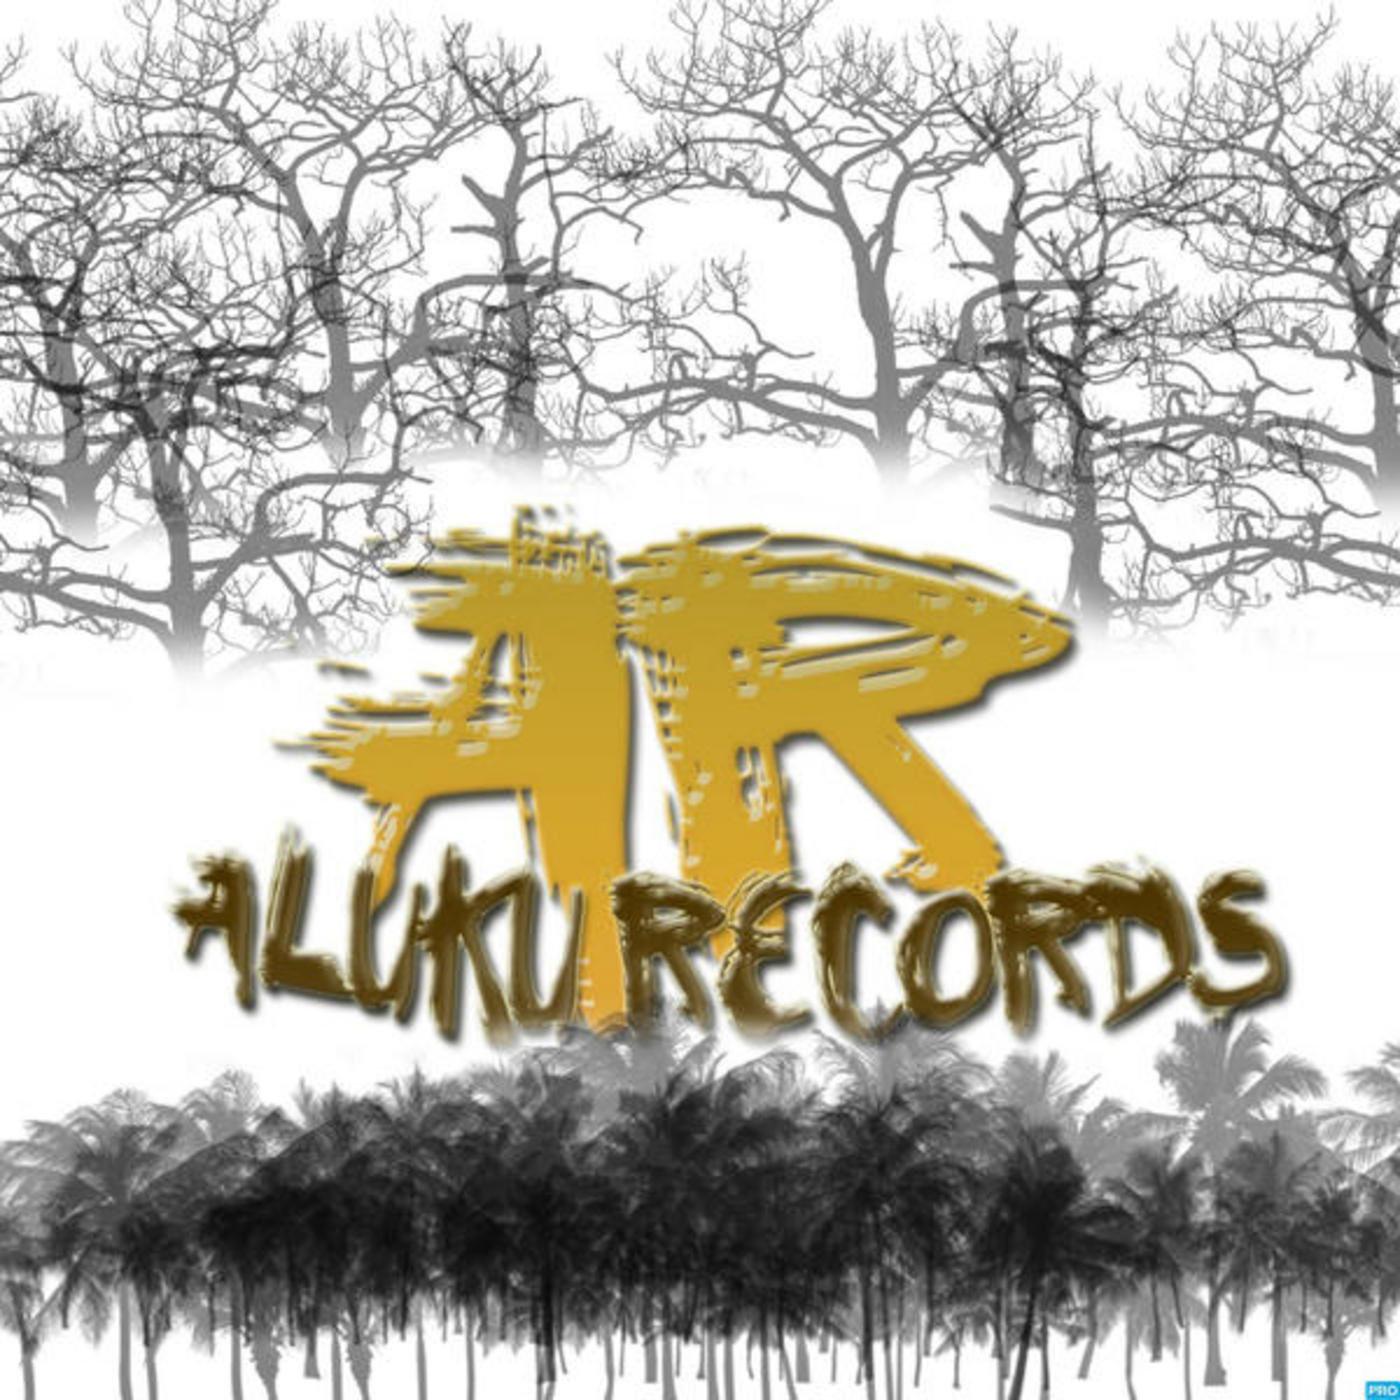 Quantum Africa .Aluku Rebels (Afro Tech/Deep/Afro Deep & Soulful House Music)SOUL FUSION PROMO MIX JULY 2015